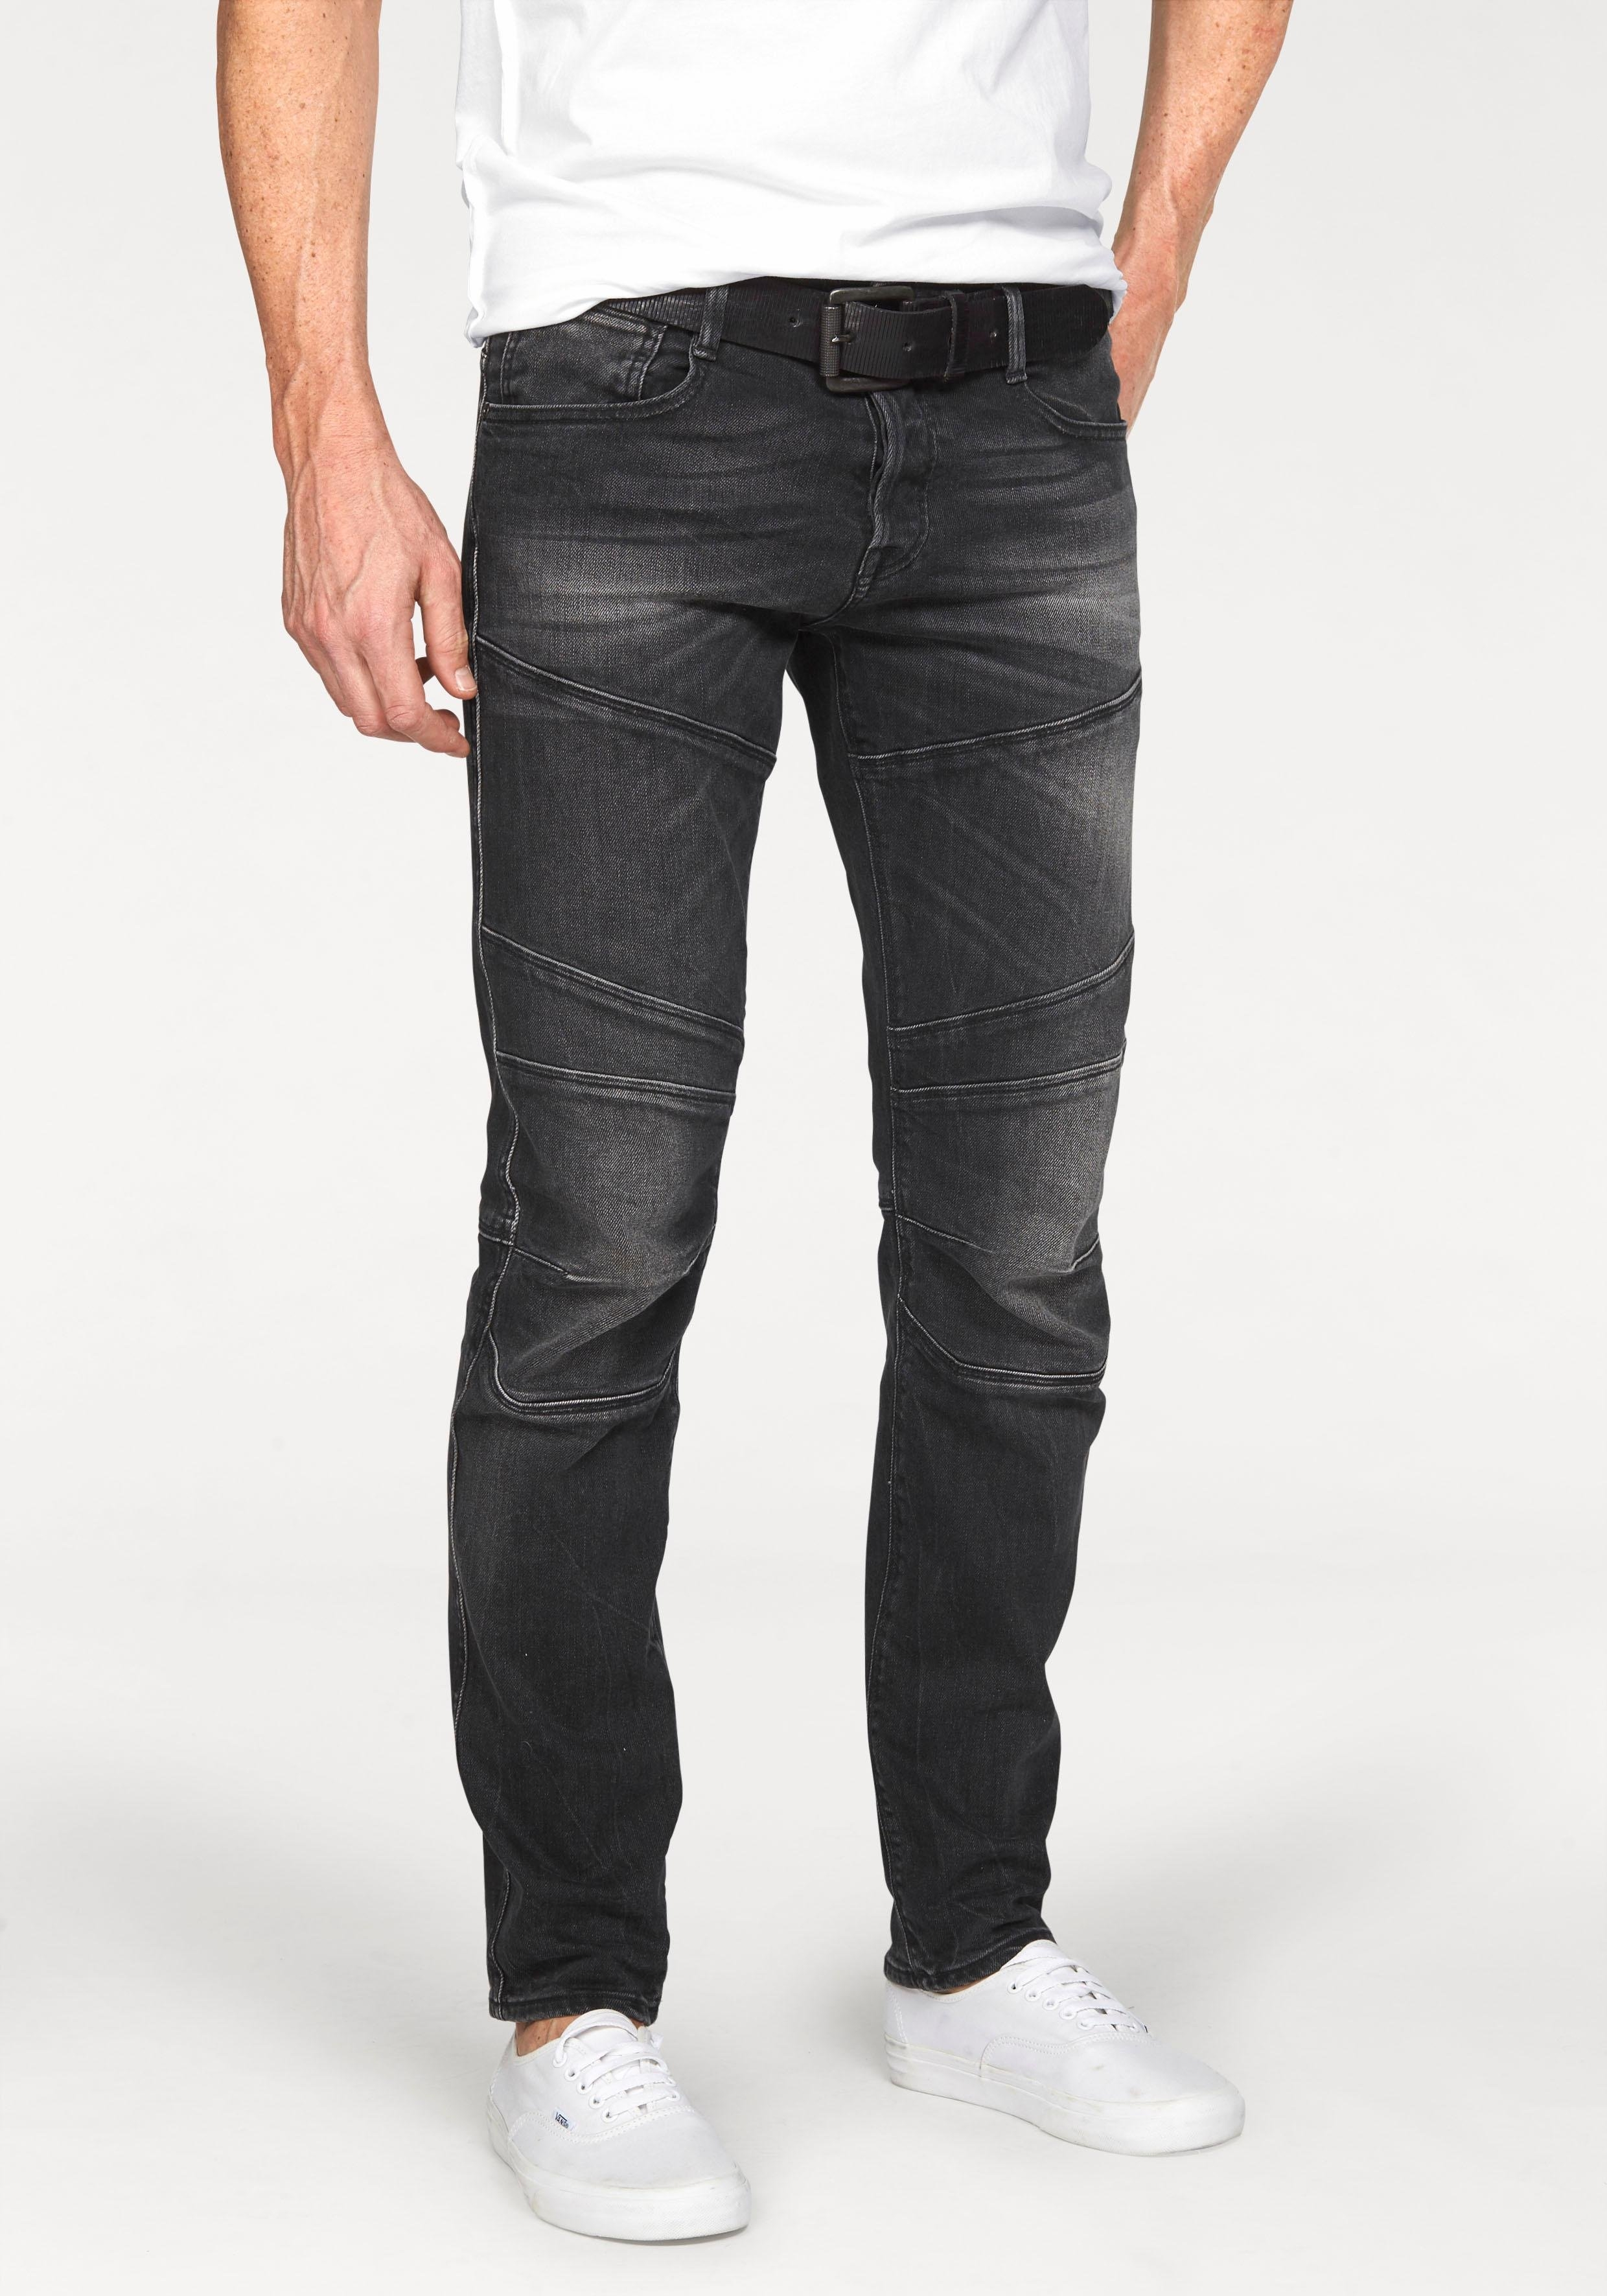 JACK & JONES Slim Fit-jeans »Glenn« voordelig en veilig online kopen